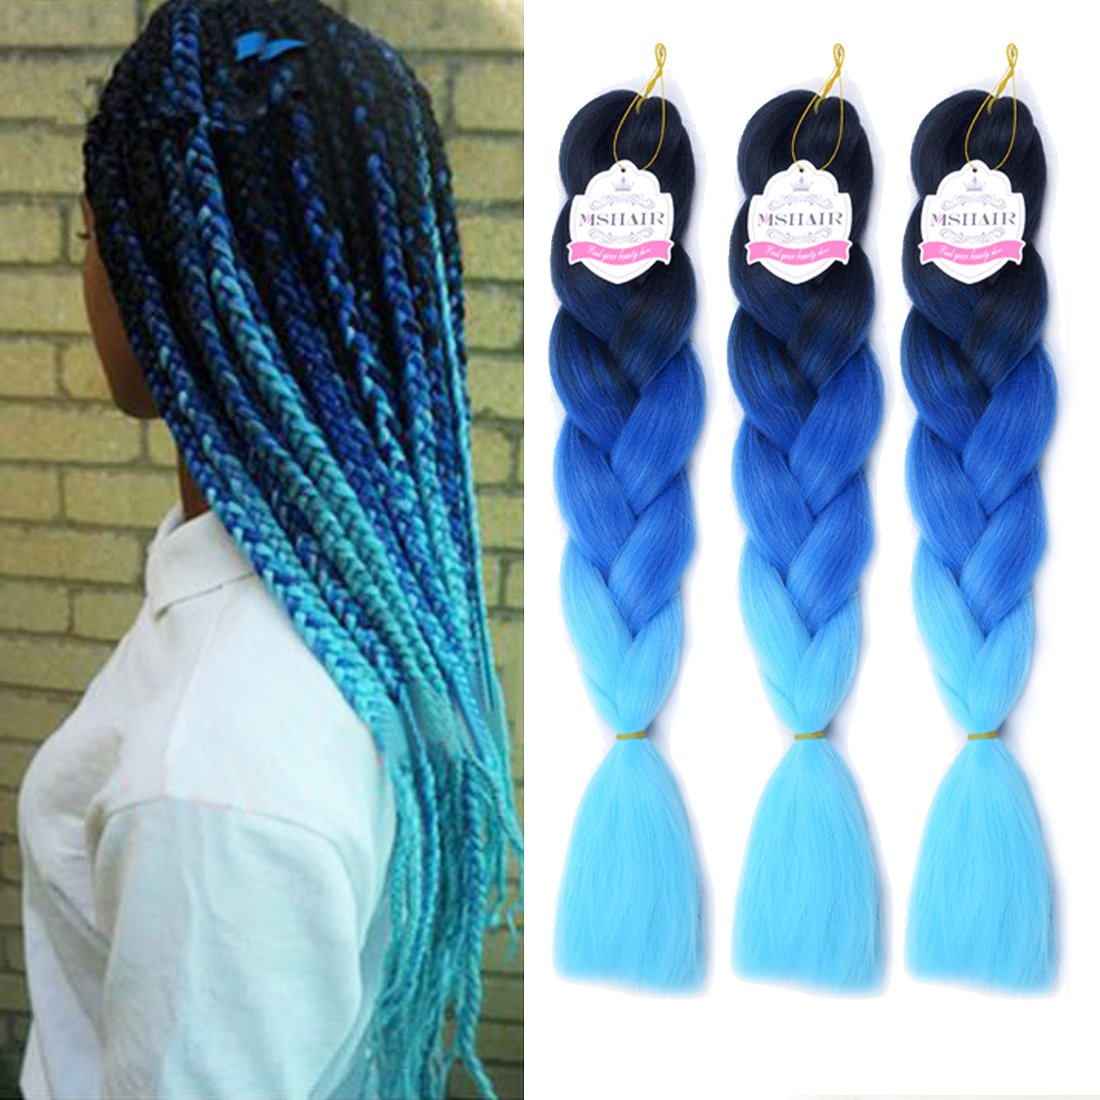 MSHAIR Ombre Jumbo Braiding Hair Extension Synthetic Kanekalon Fiber for Twist Braiding Hair Black/Blue/Light Blue Color 24 Inch 3 Pieces/lot